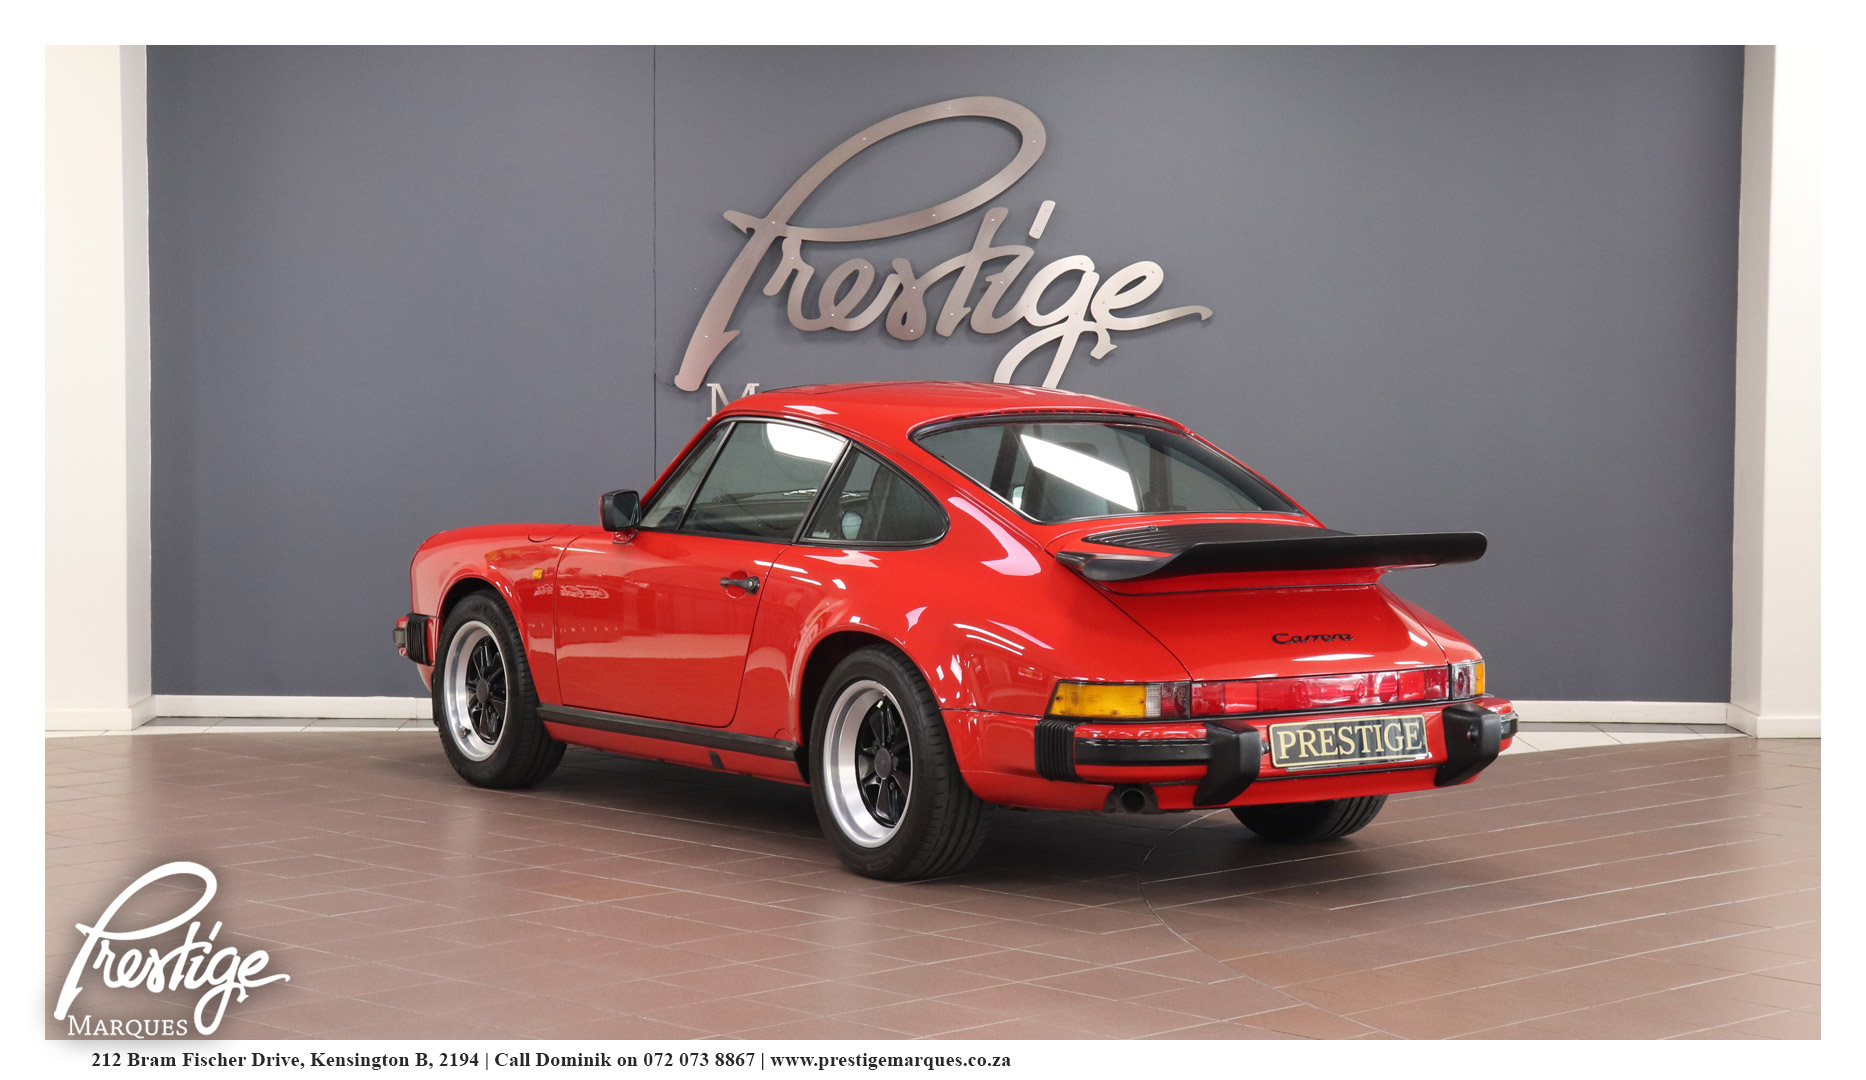 1989-Porsche-911-Carerra-3.2-350-Prestige-Marques-Randburg-Sandton-6